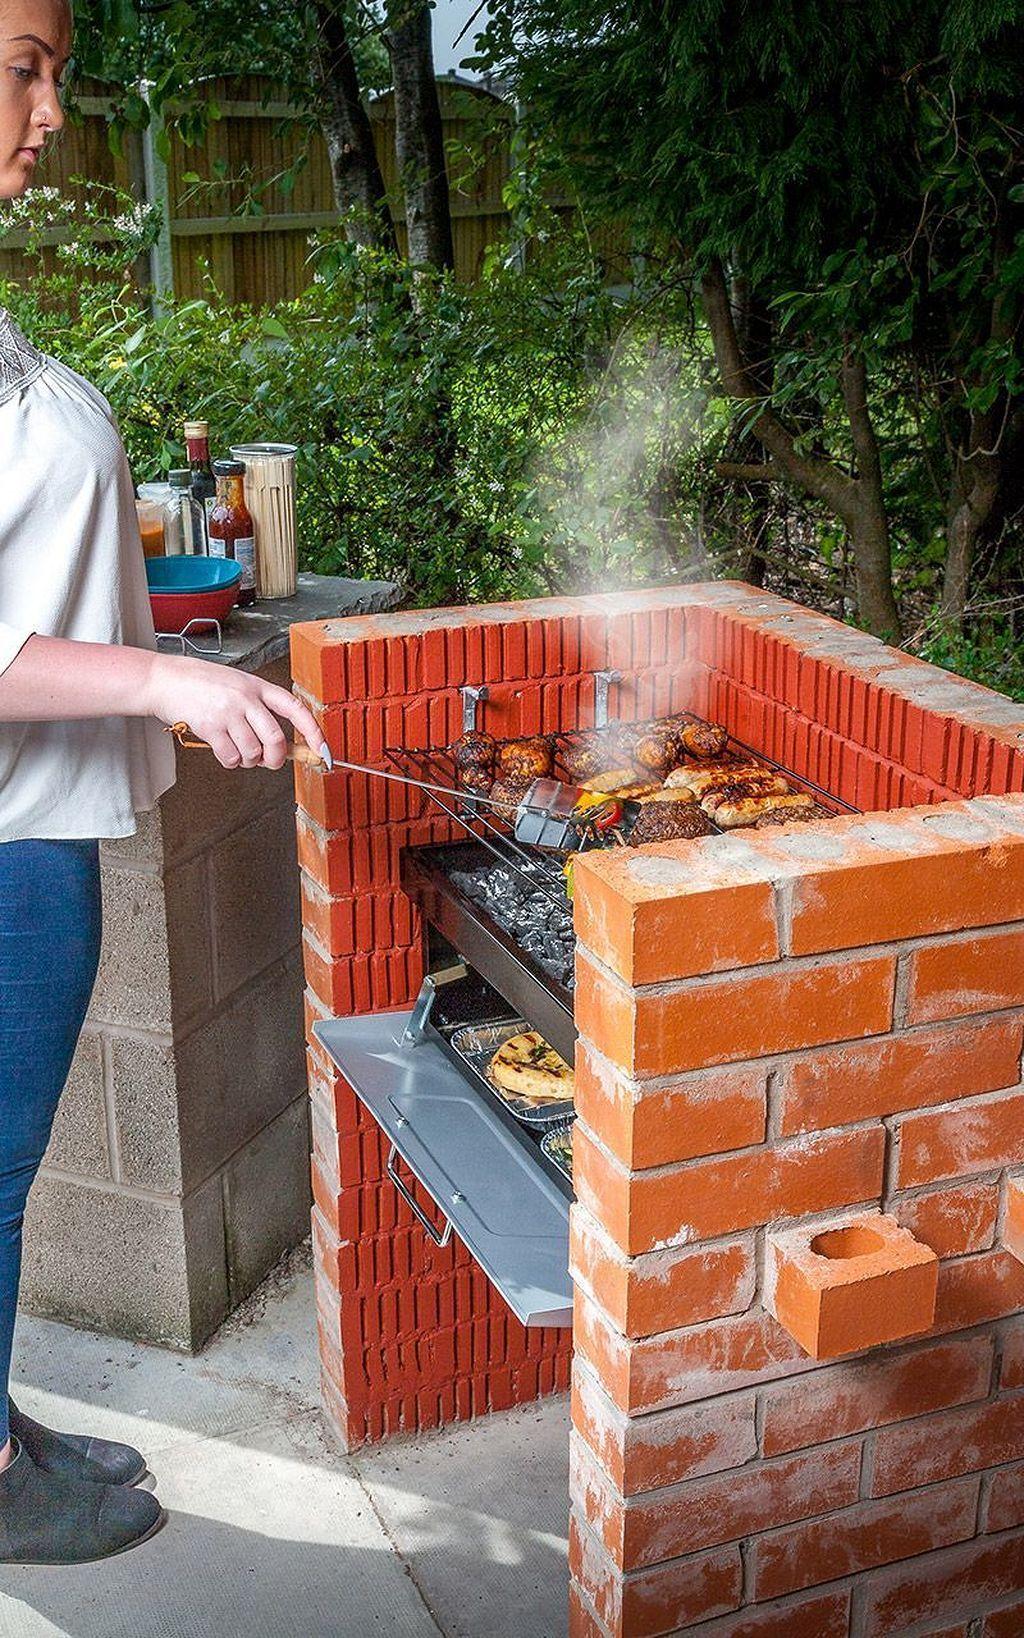 Best Diy Backyard Brick Barbecue Ideas13 Homegardenmagz Diy Backyard Backyard Grilling Barbecue Ideas Backyard